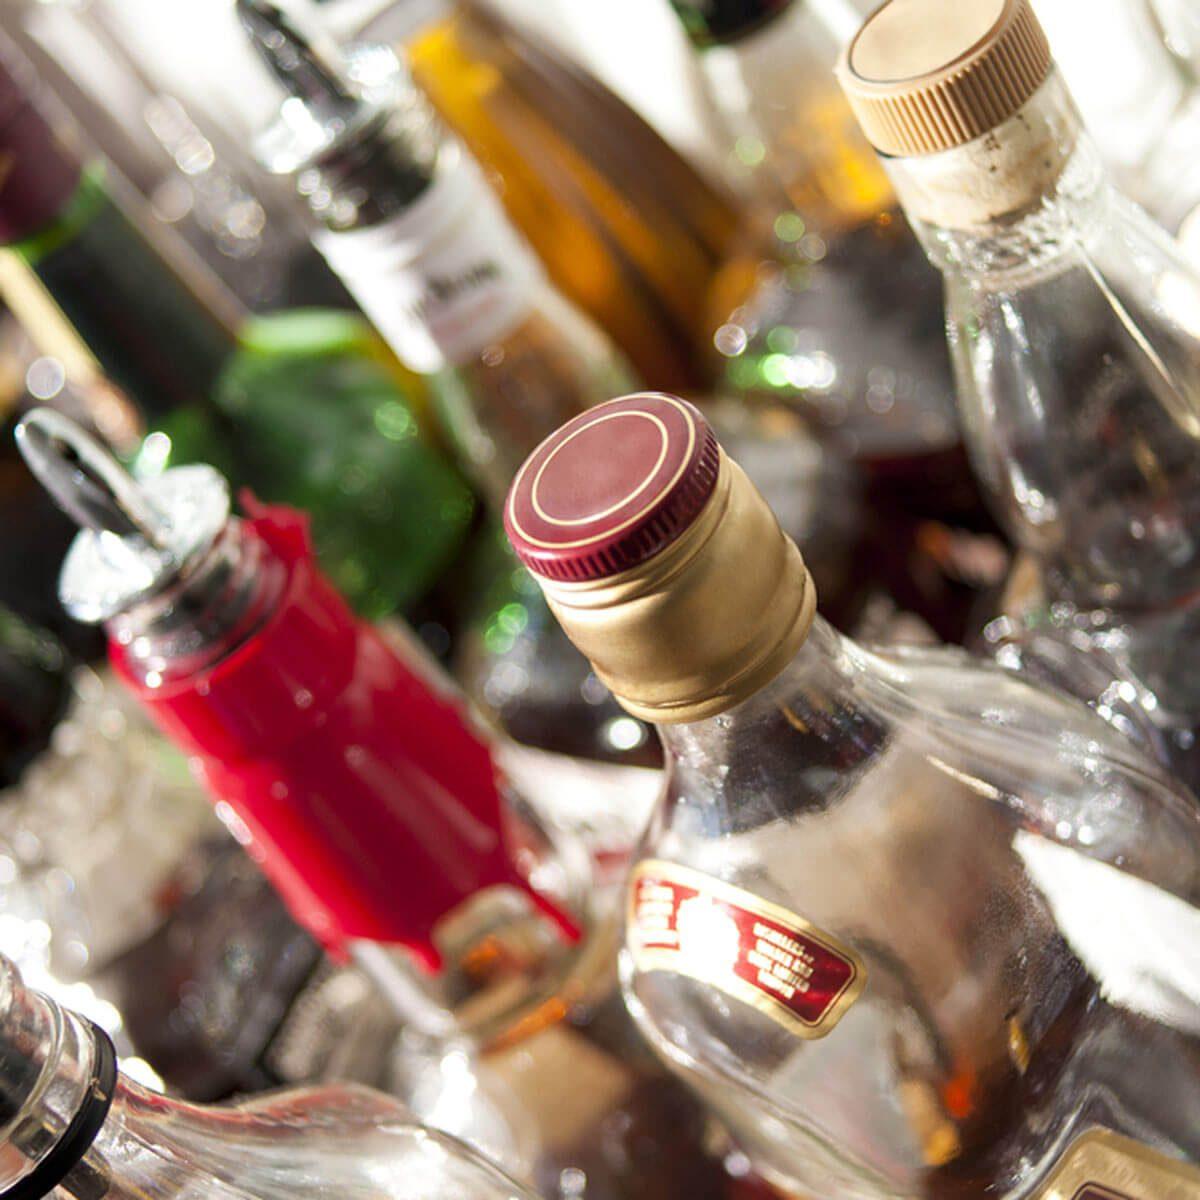 Liquor alcohol cabinet